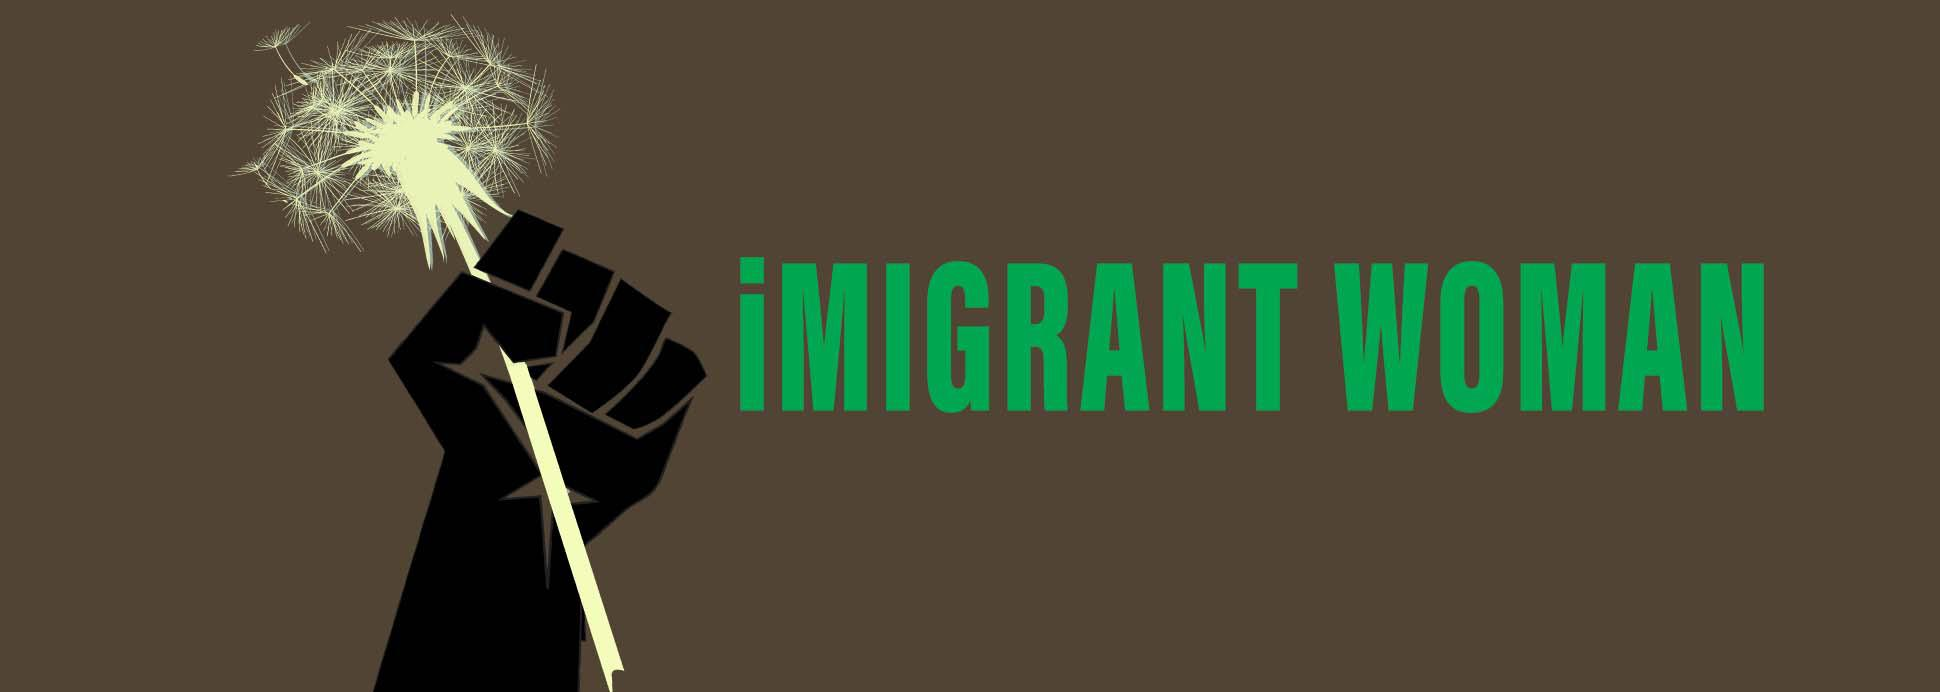 iMigrant Woman